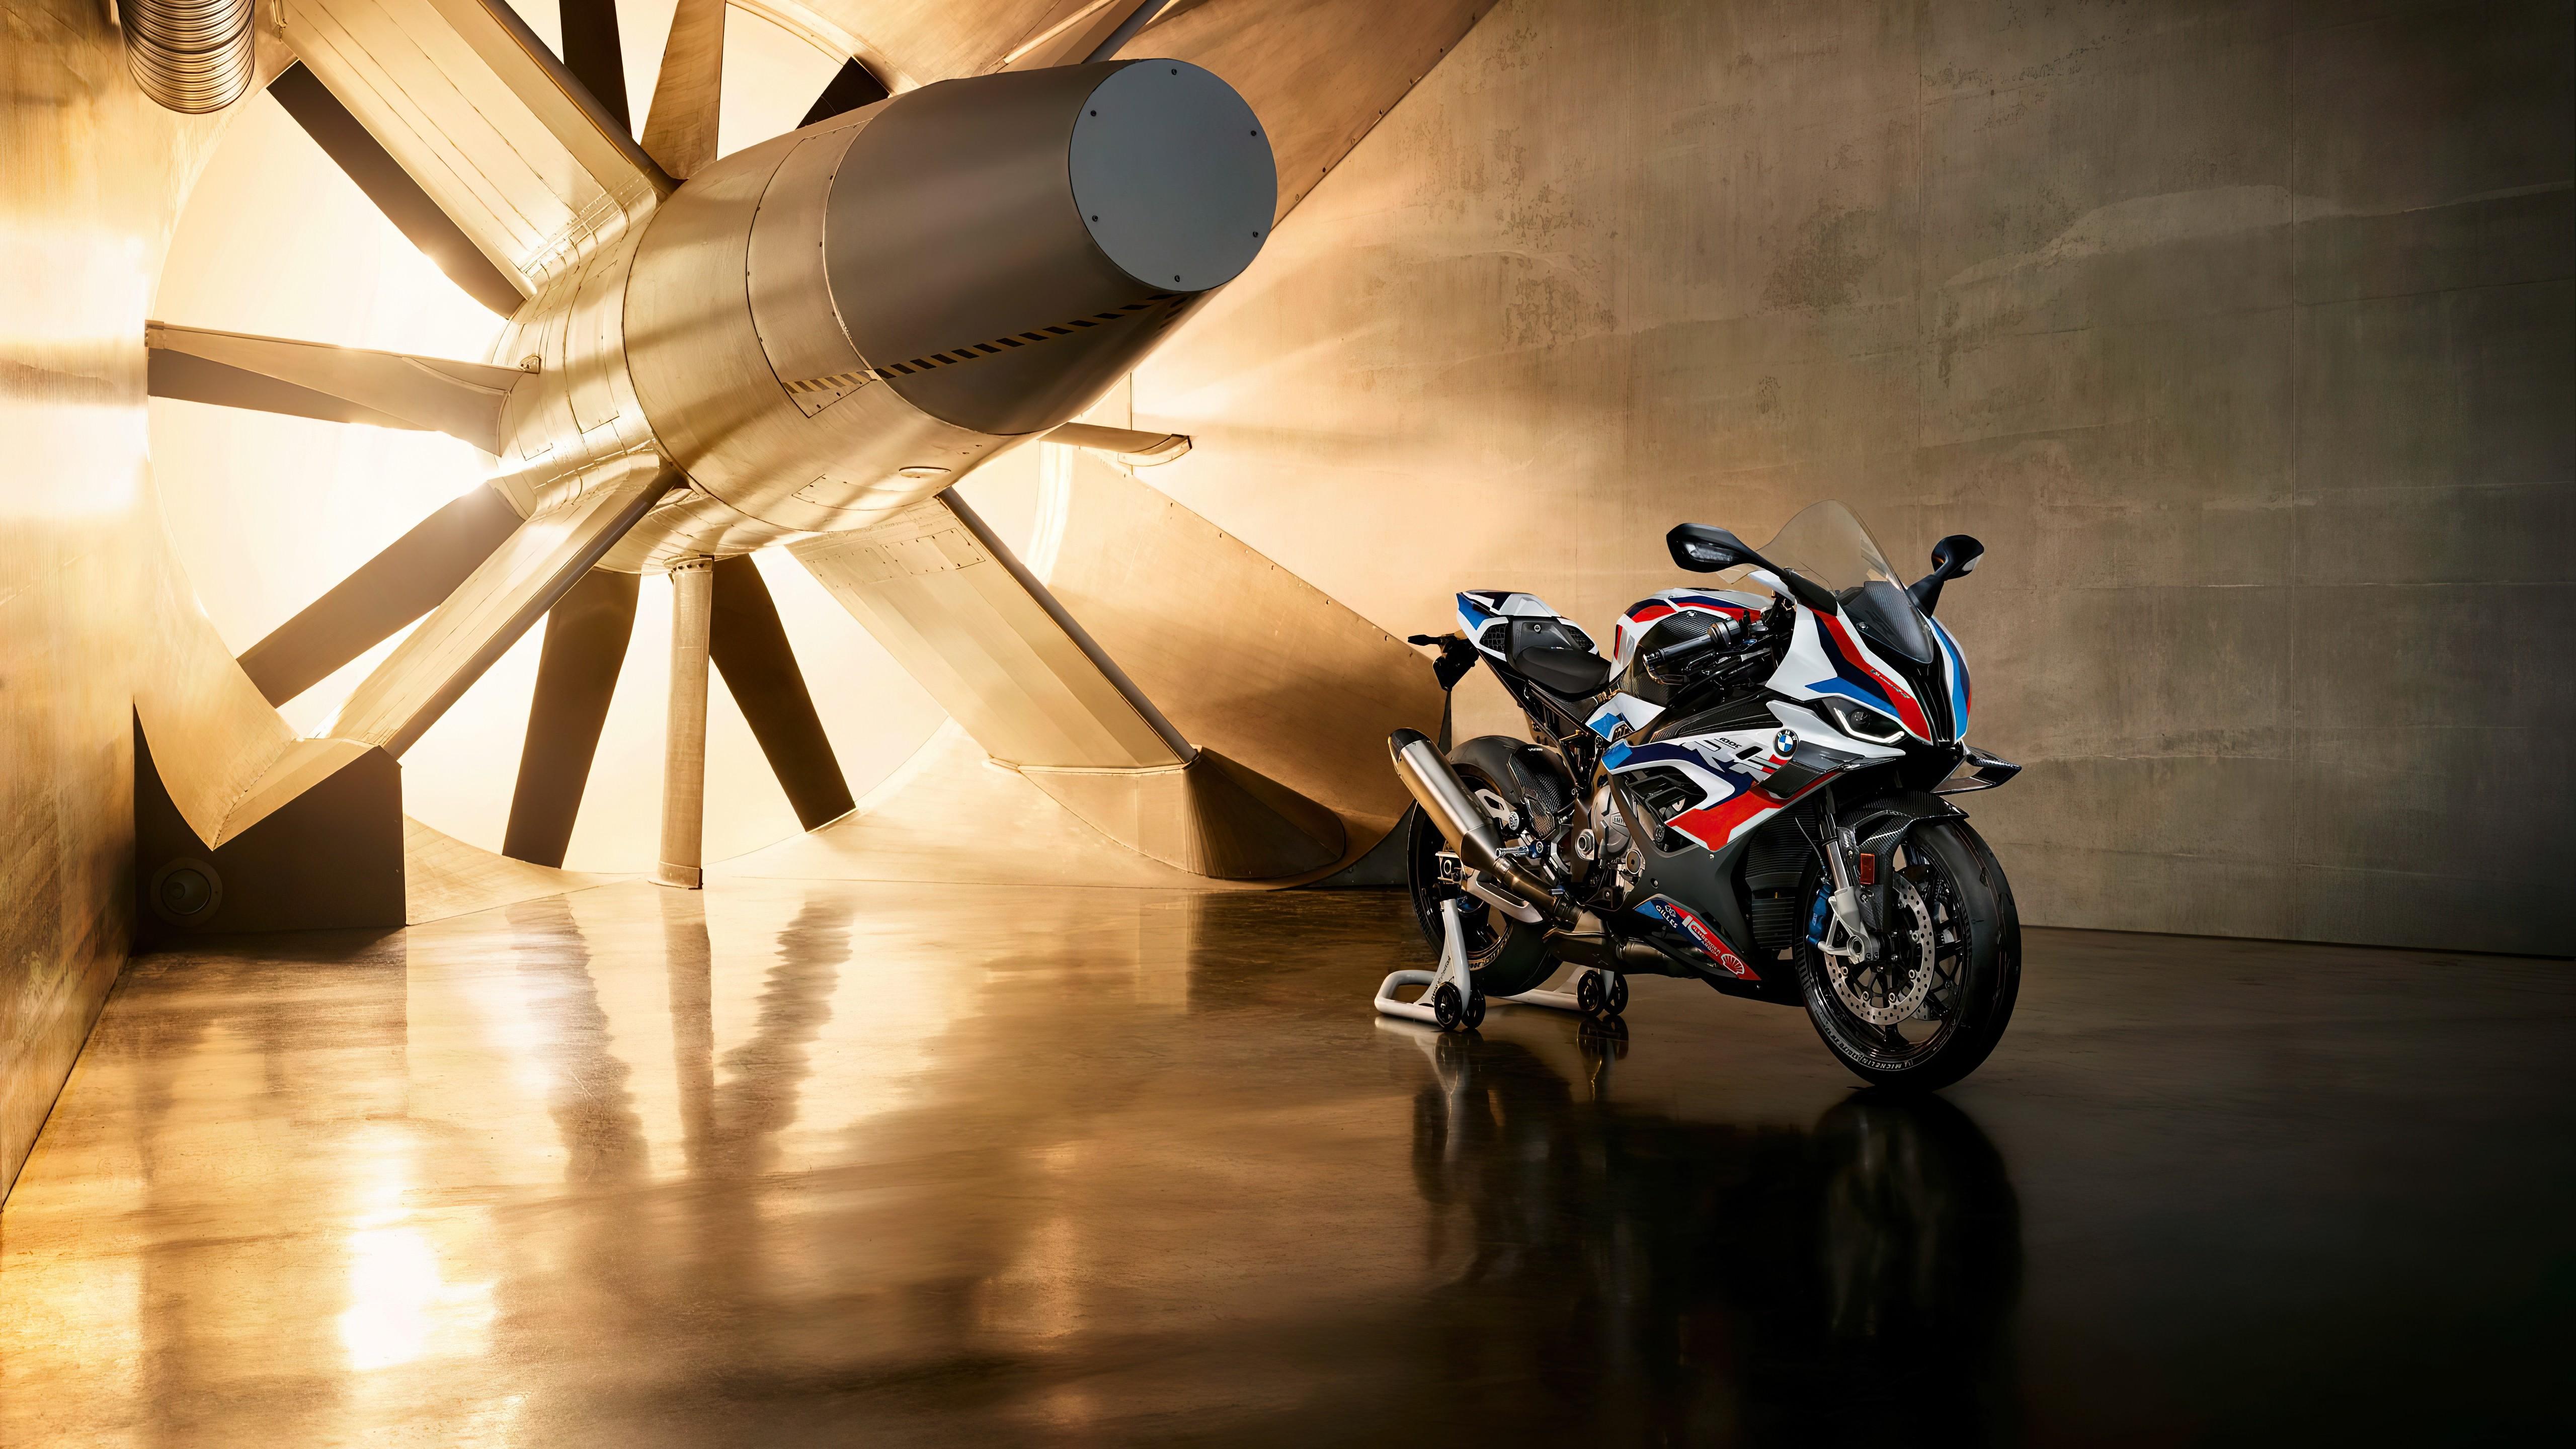 Bmw M1000rr 5k, HD Bikes, 4k Wallpapers, Images ...